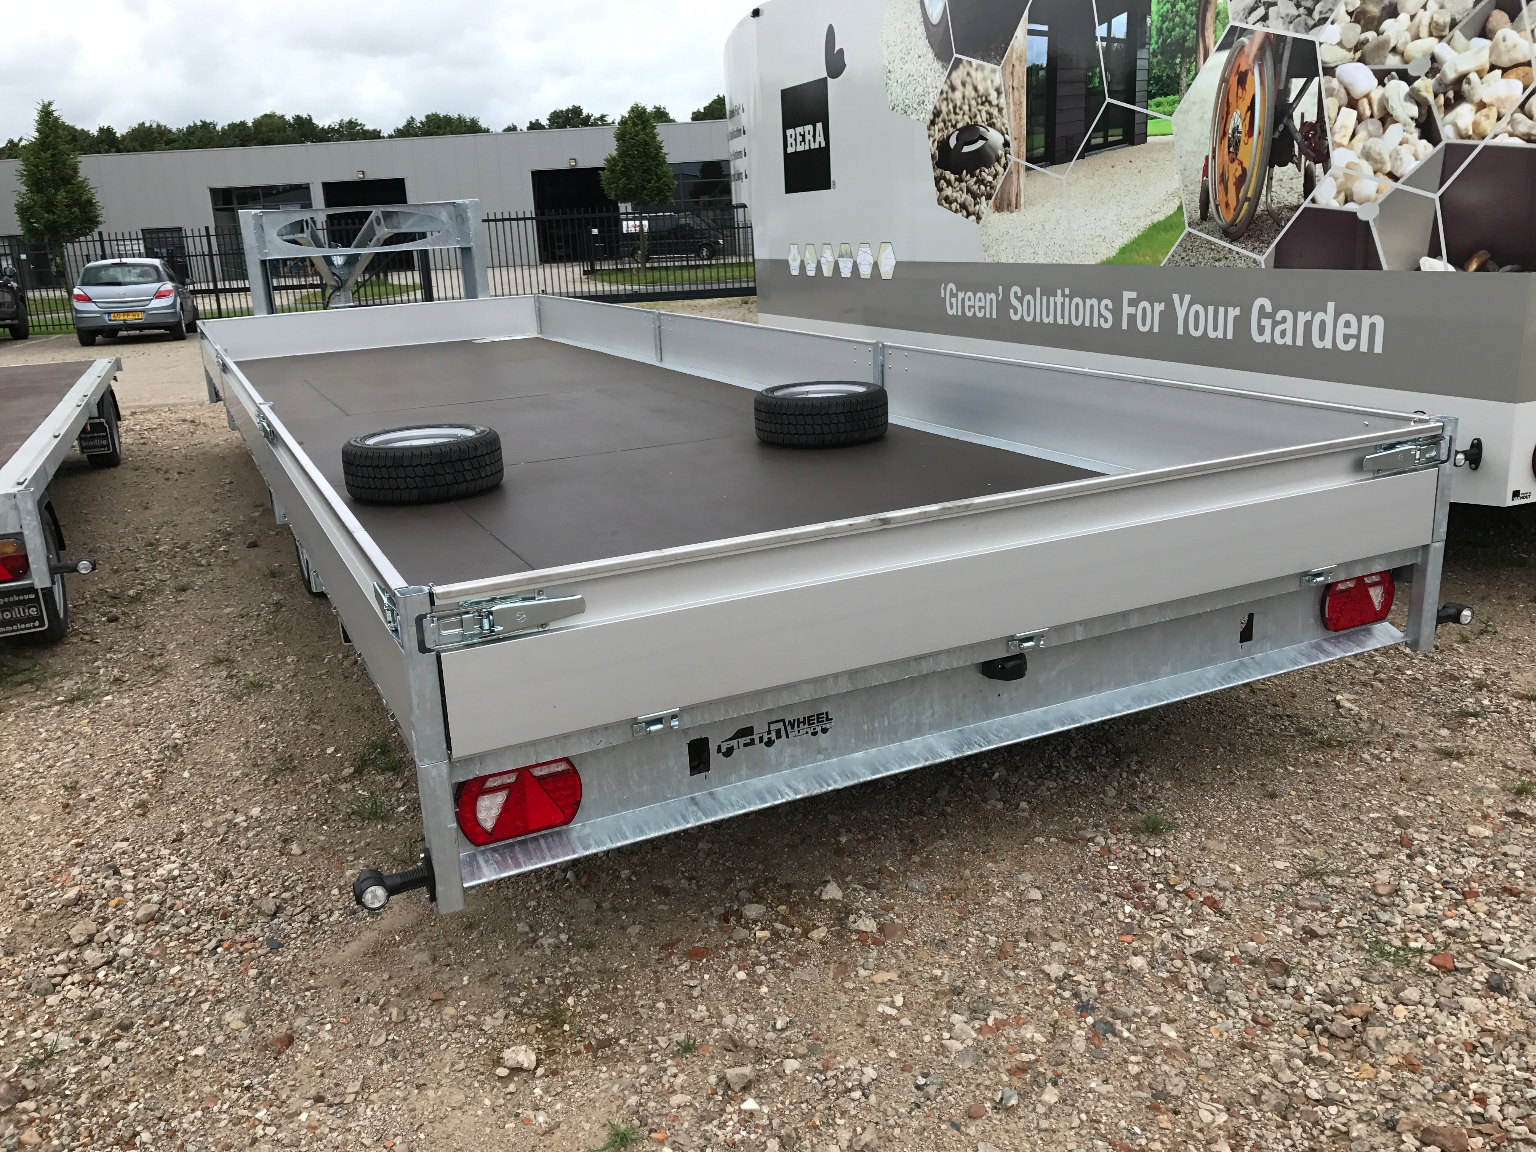 Fifthwheel, BE oplegger, vlakke trailer